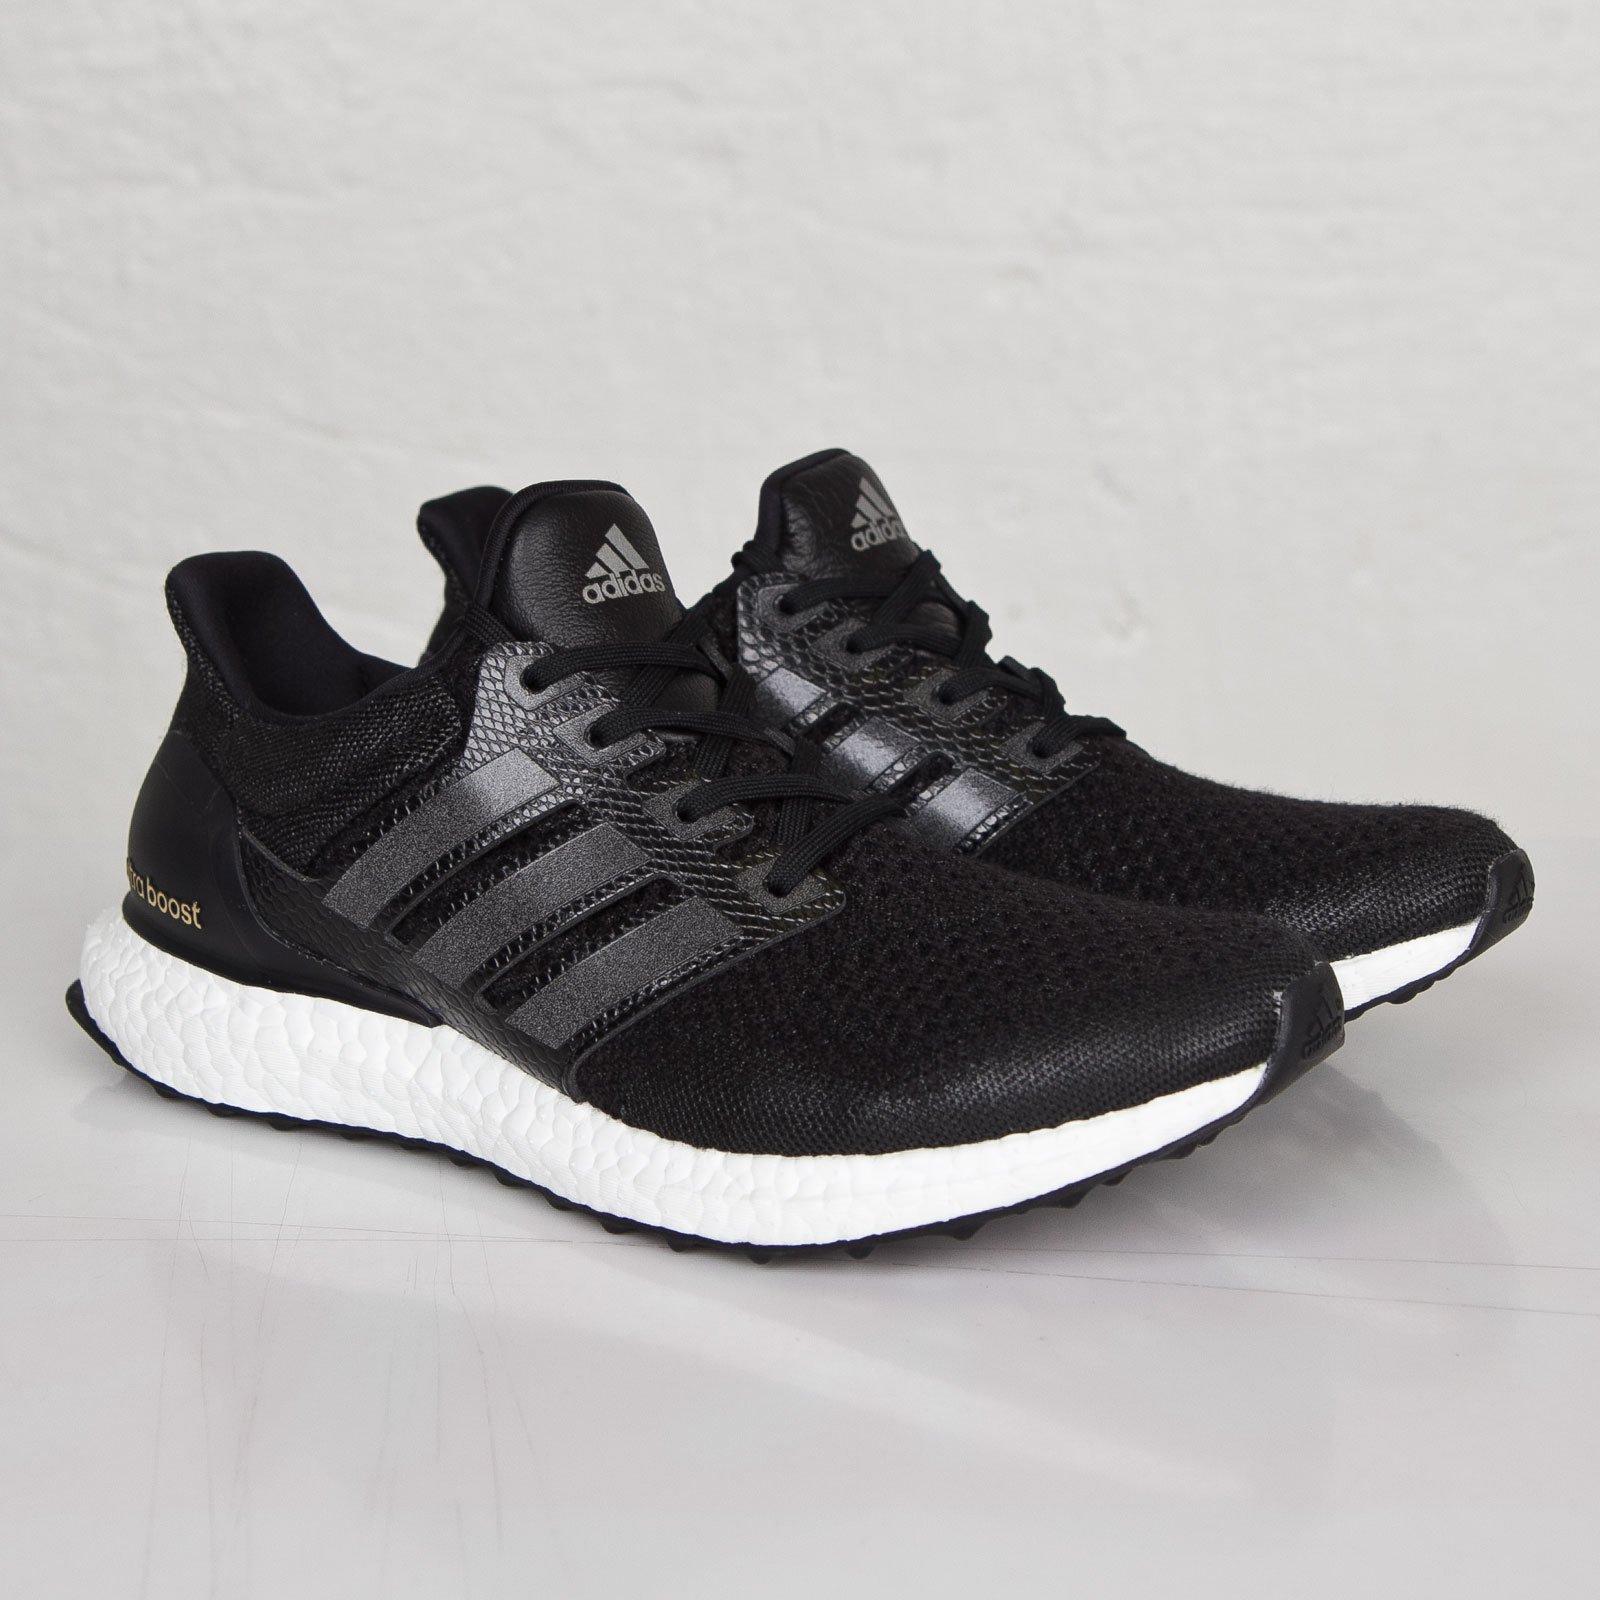 Adidas ultra impulso j & d s78705 scarpe da ginnasticanstuff scarpe